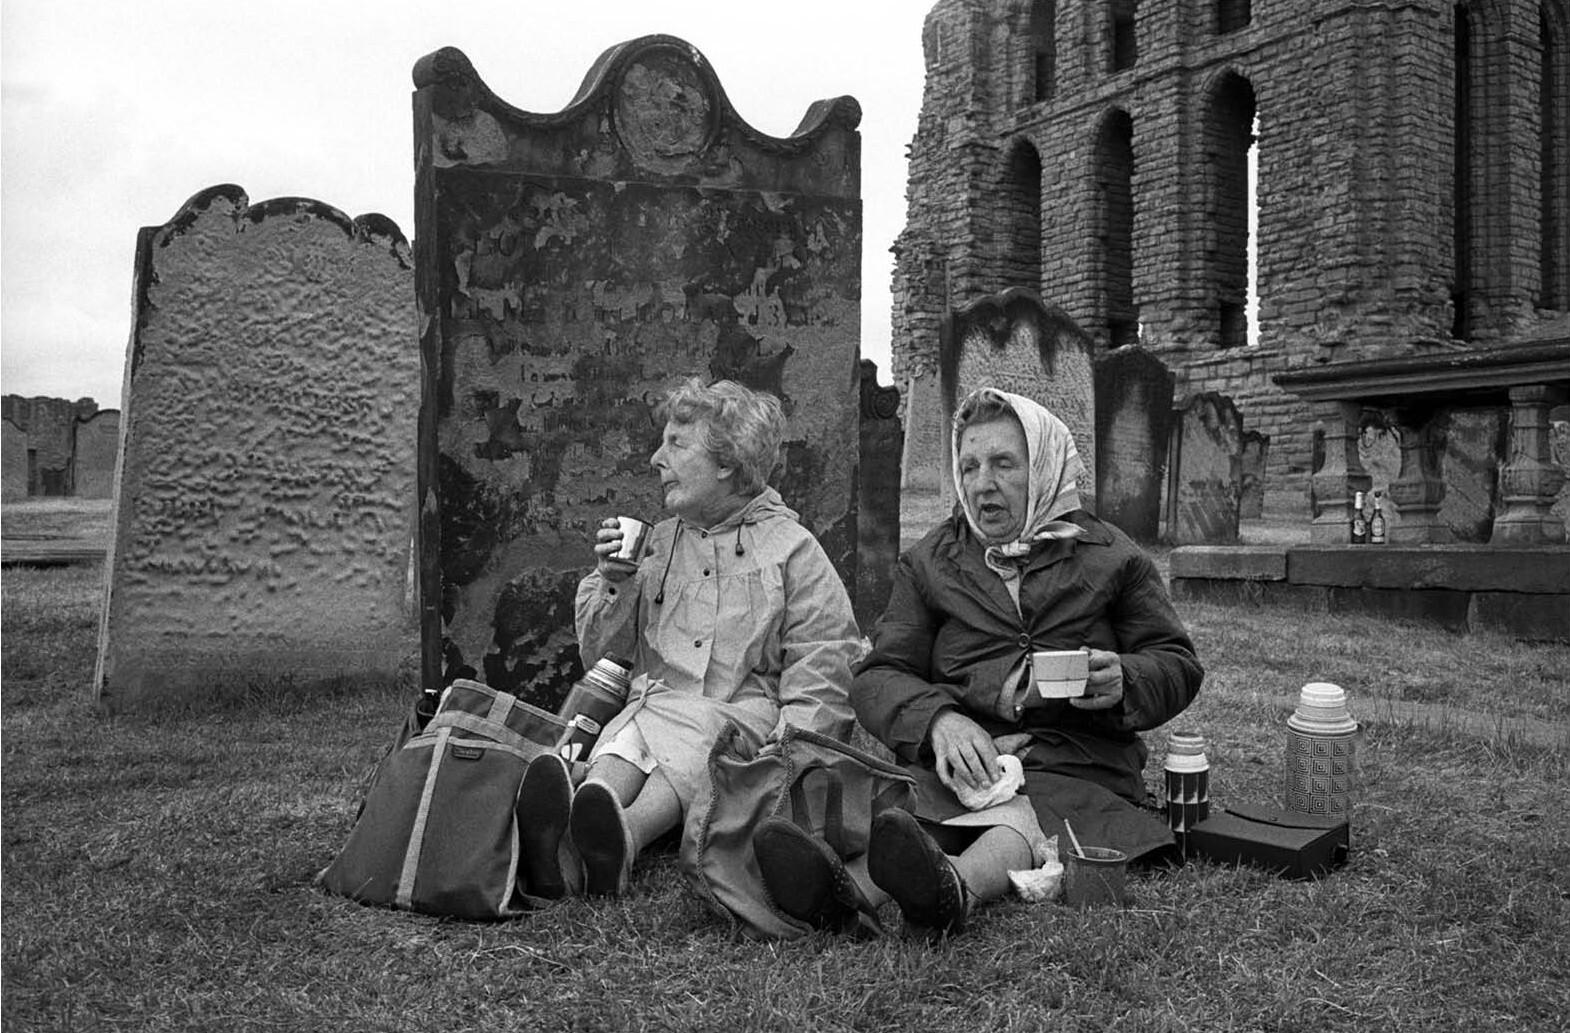 Чаепитие. Англия, 1970-80-е. Фотограф Боб Уоткинс